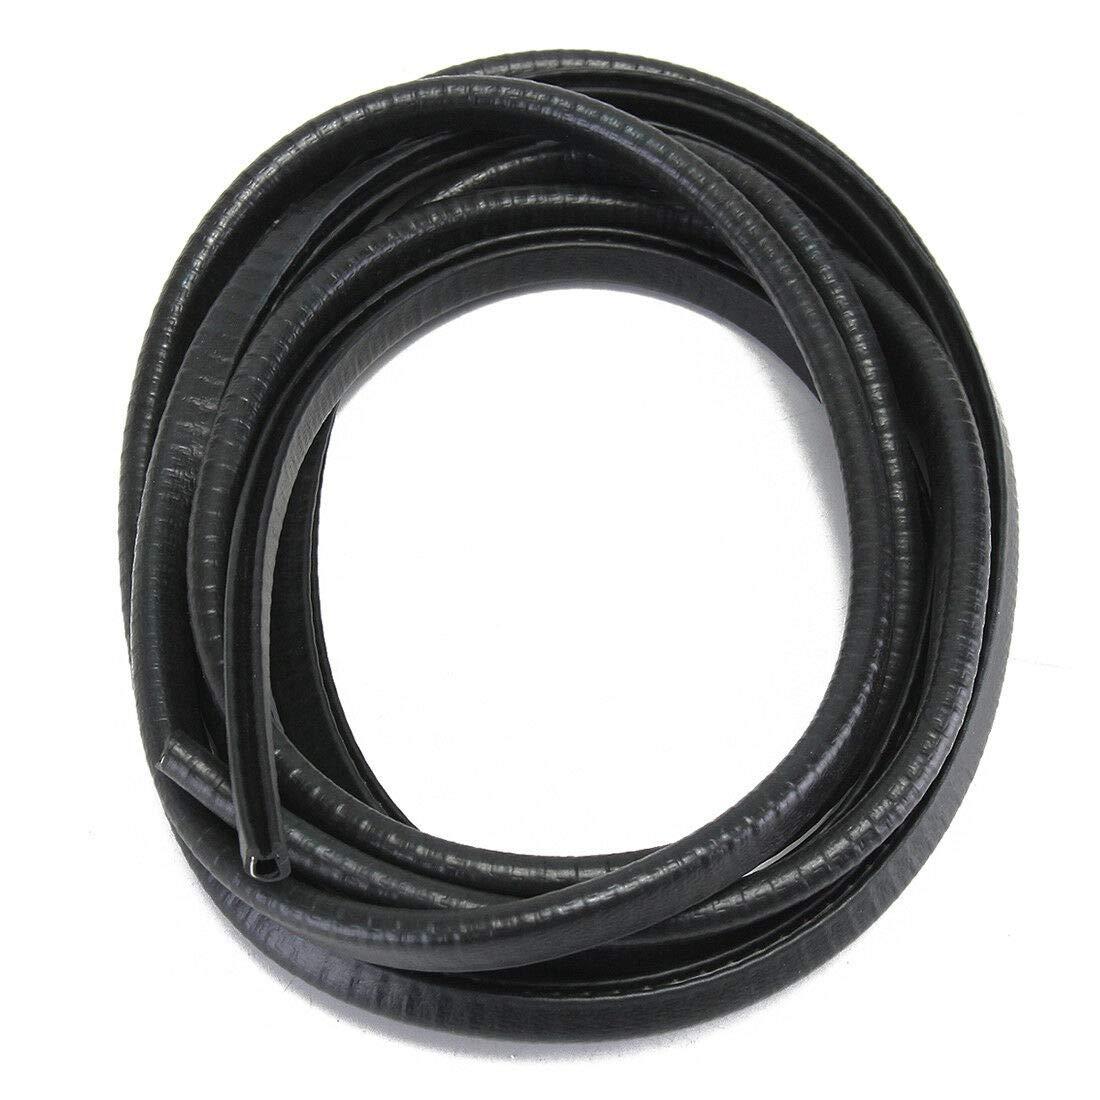 13FT(4M)Black Car Auto Edge Protector U-shaped Rubber Seal Trim Molding Strip